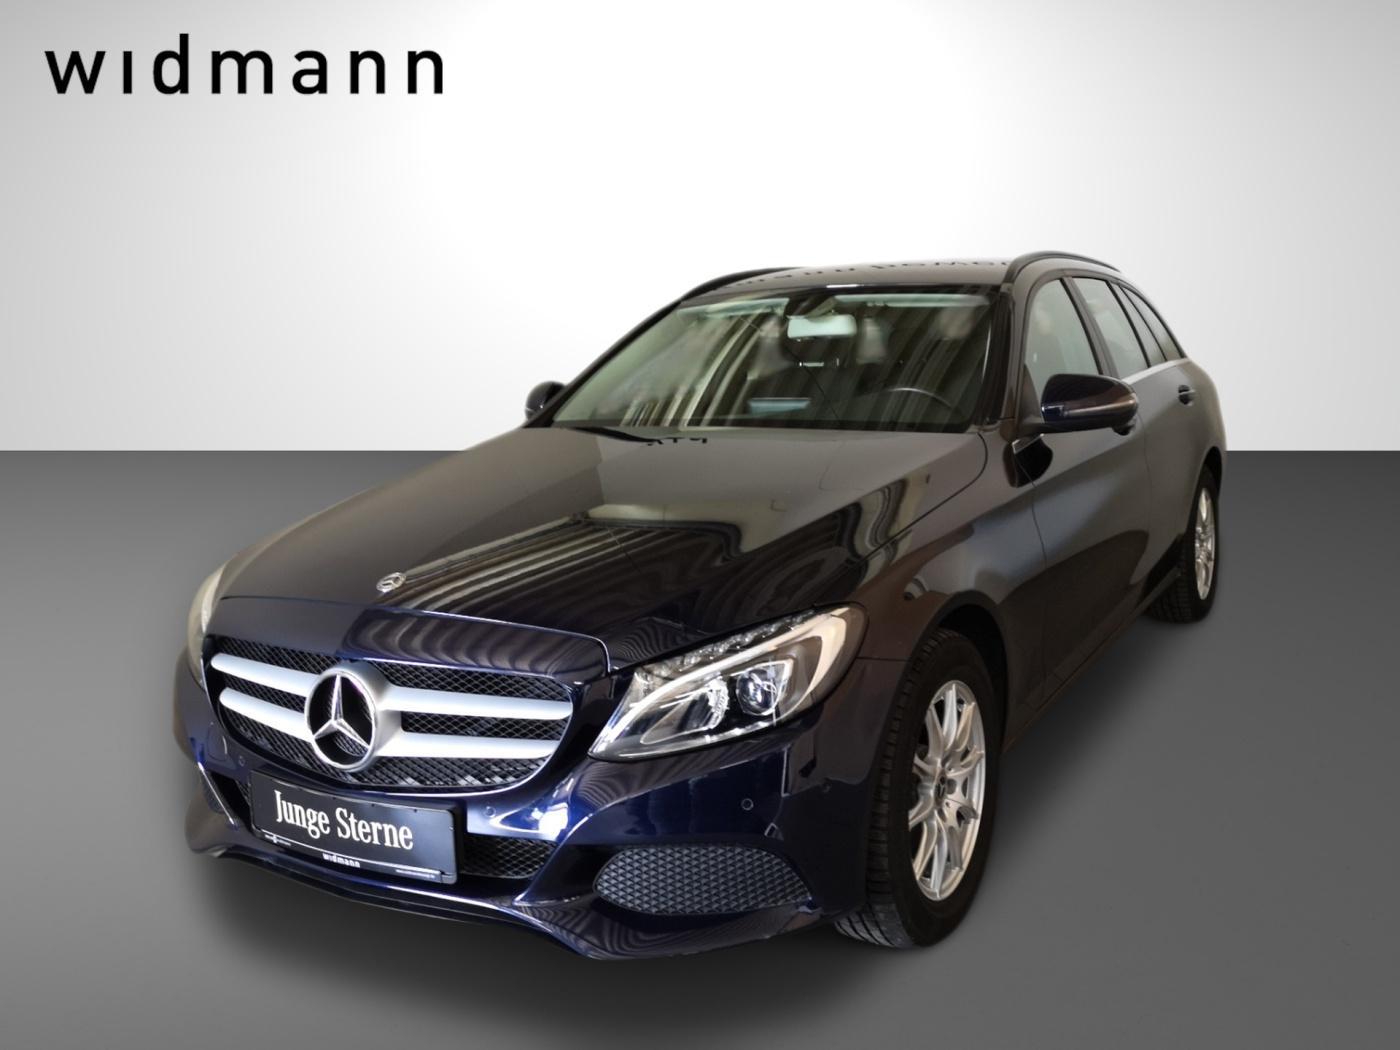 Mercedes-Benz C 200 d T *LED*AHK*Navi*Sitzheizung*9G-TRONIC*, Jahr 2018, Diesel